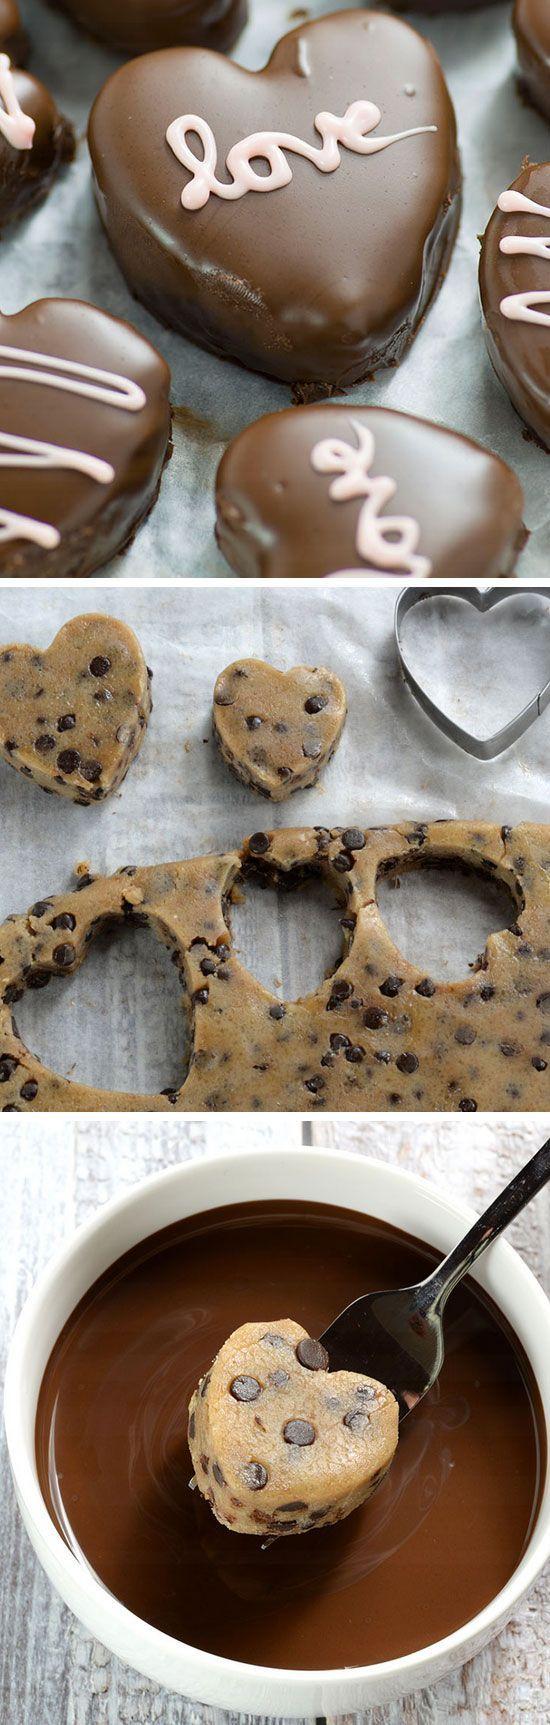 18 Delicious Valentine Dessert Recipes For Two